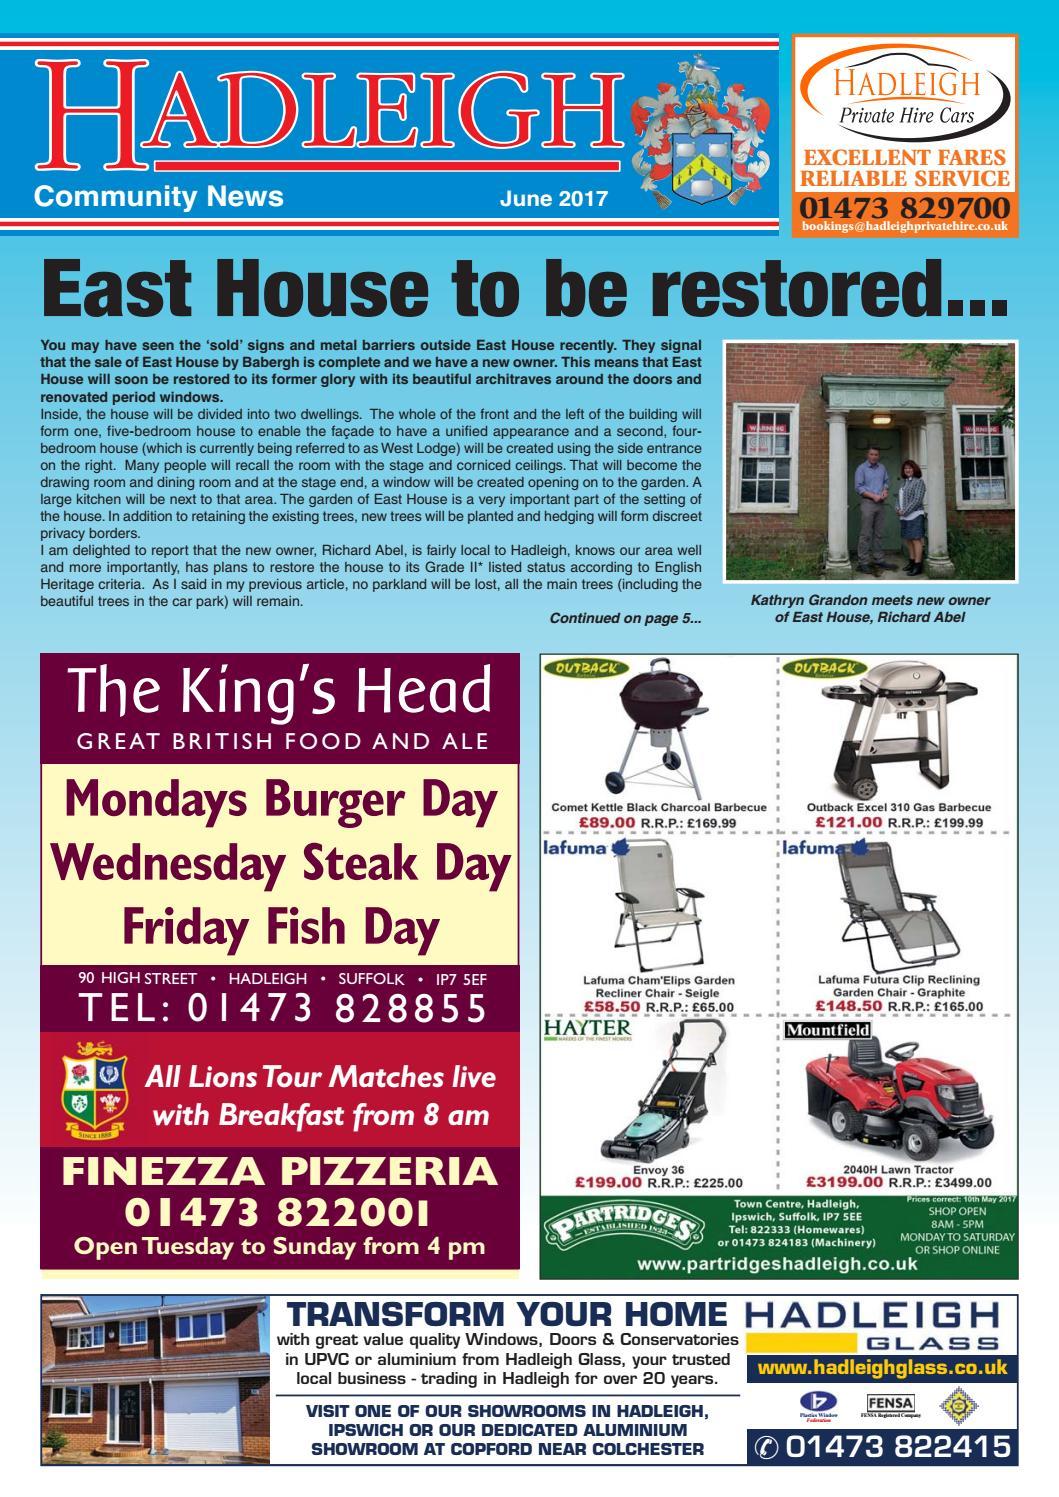 Hadleigh Community News, June 2017 by Keith Avis Printers